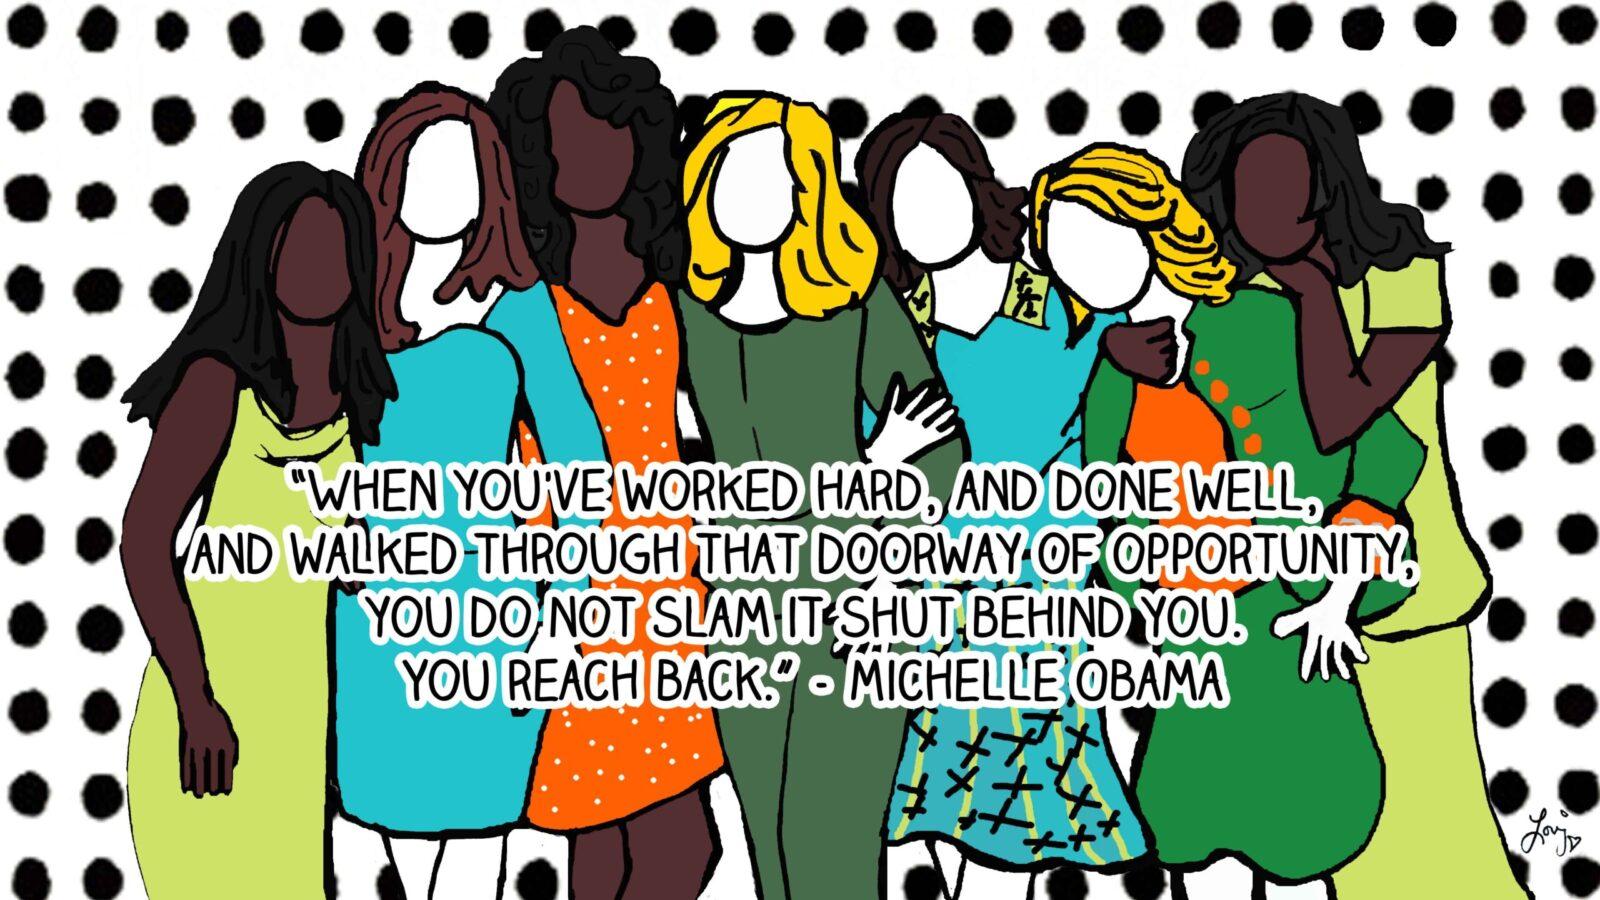 CNN International Women's Day: Inspiring Words Transformed into Images